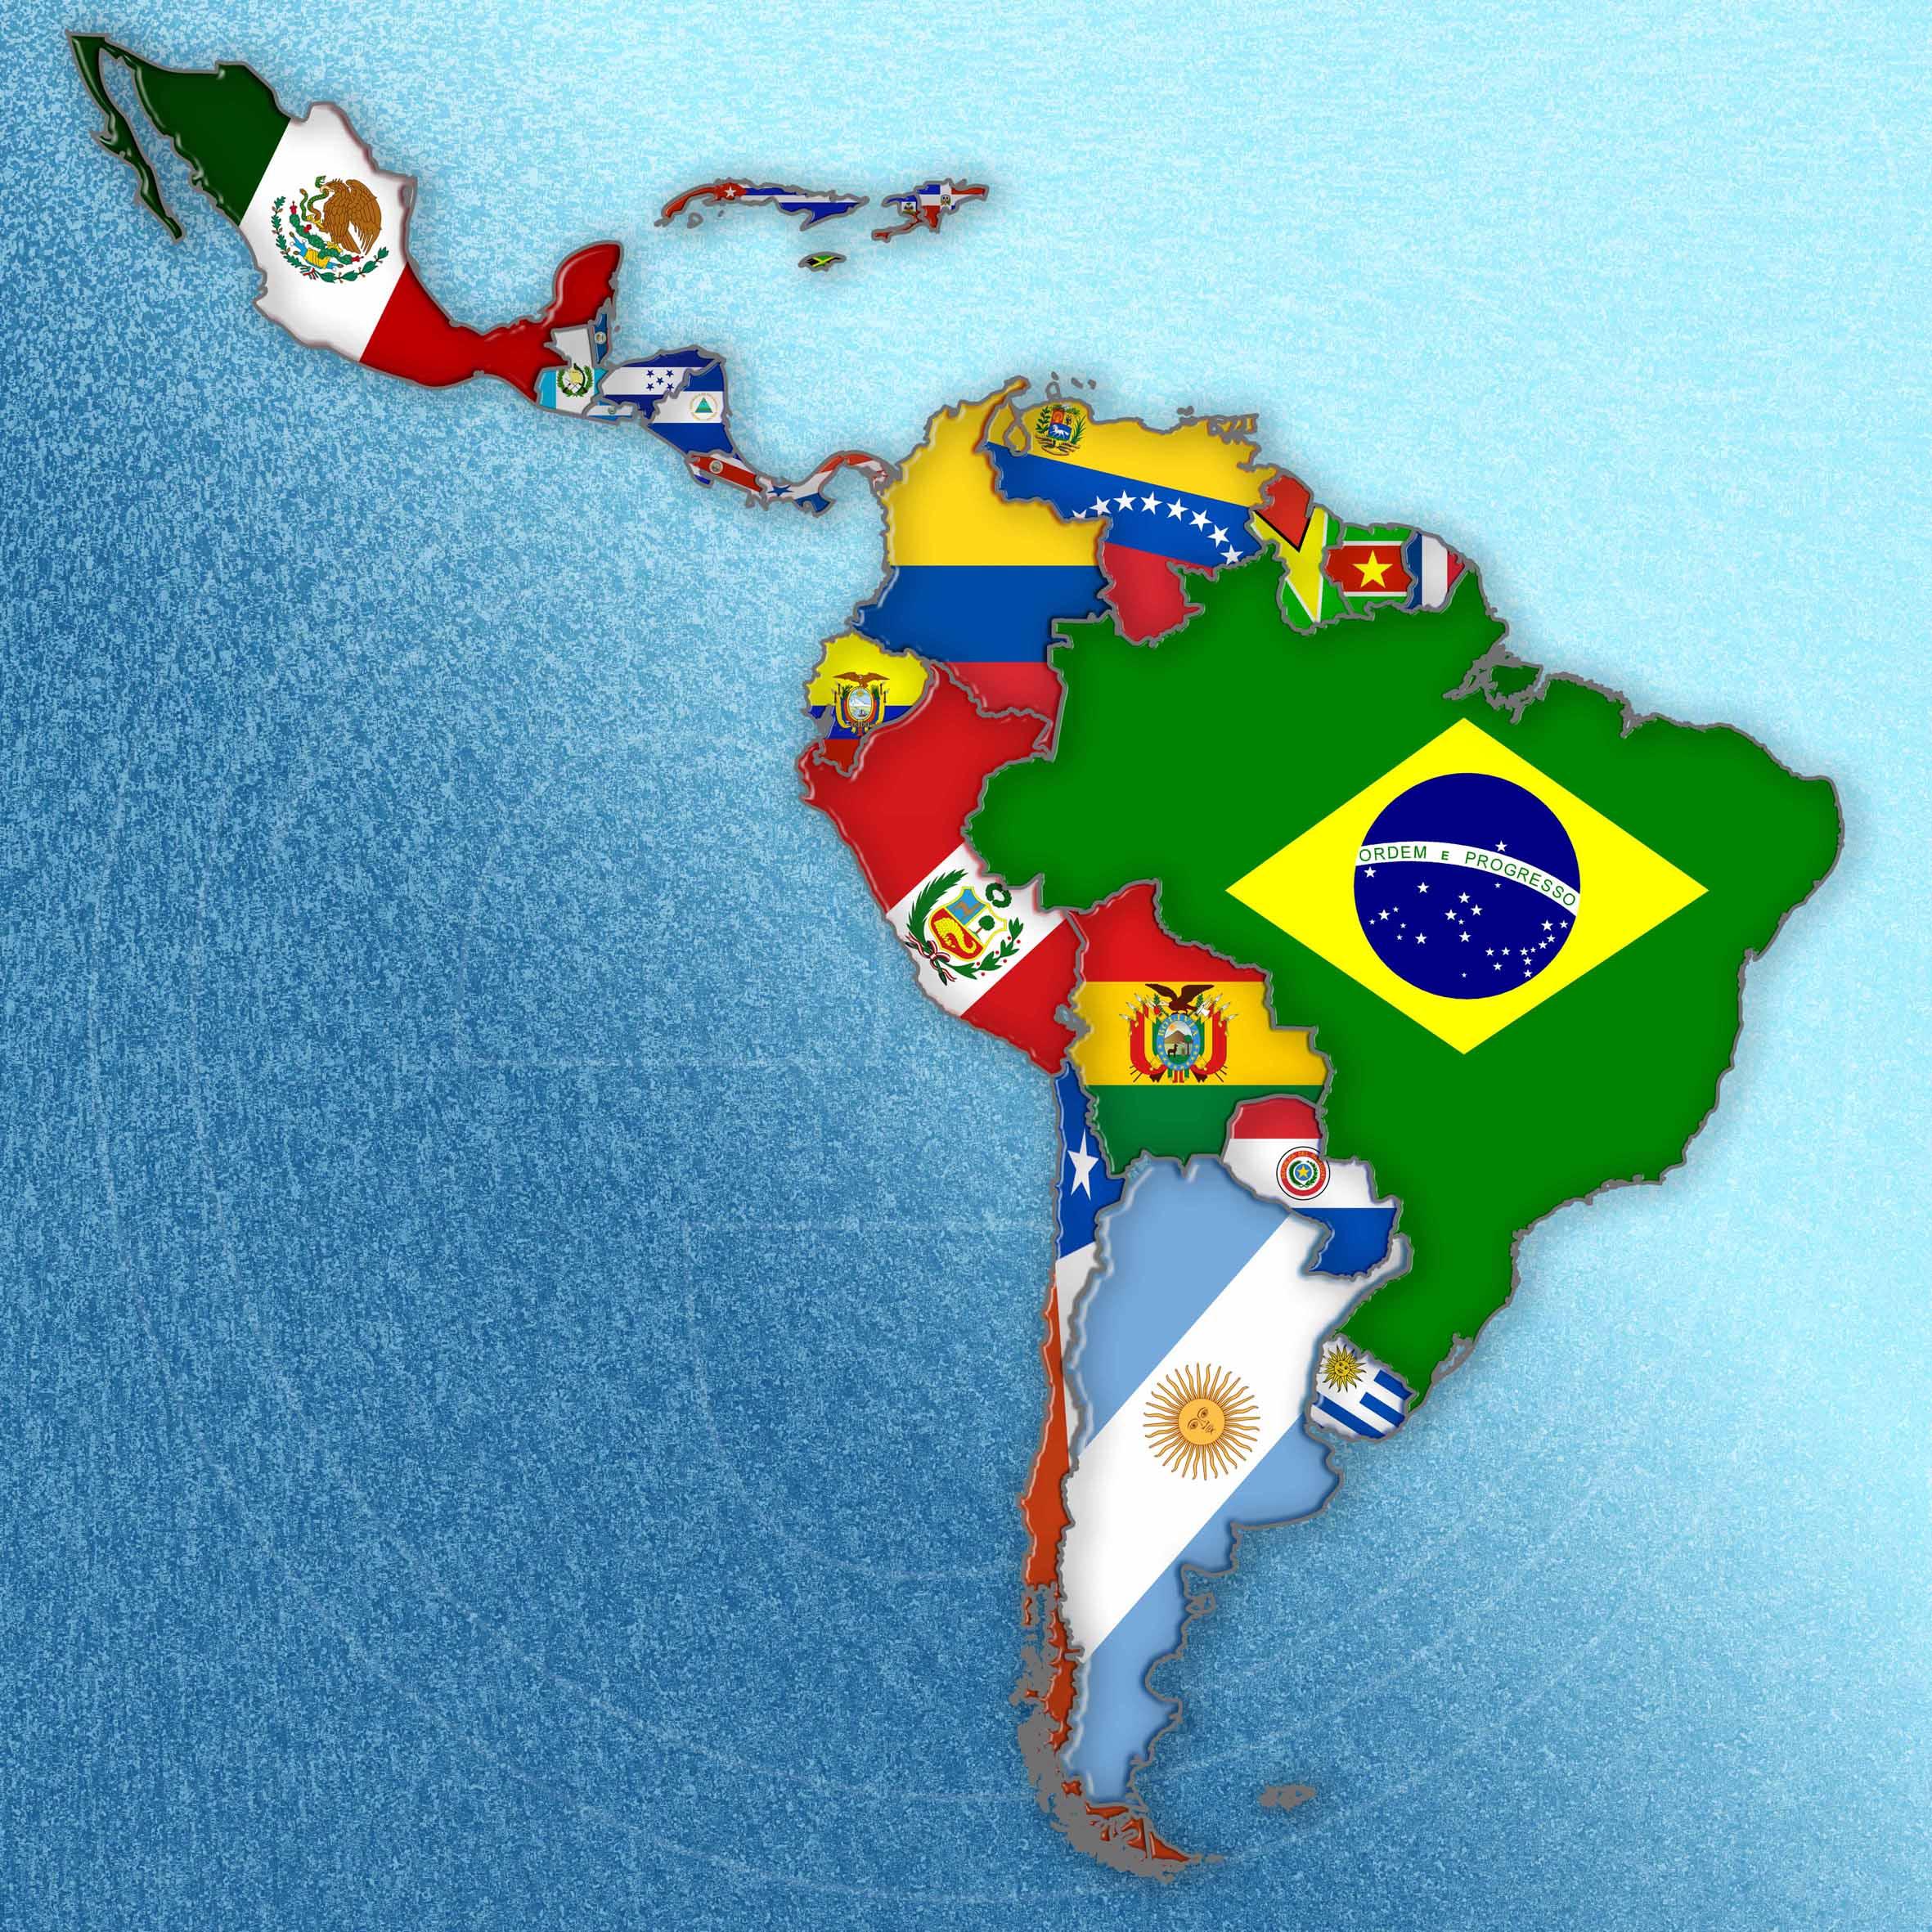 Imagen de www.interoute.es